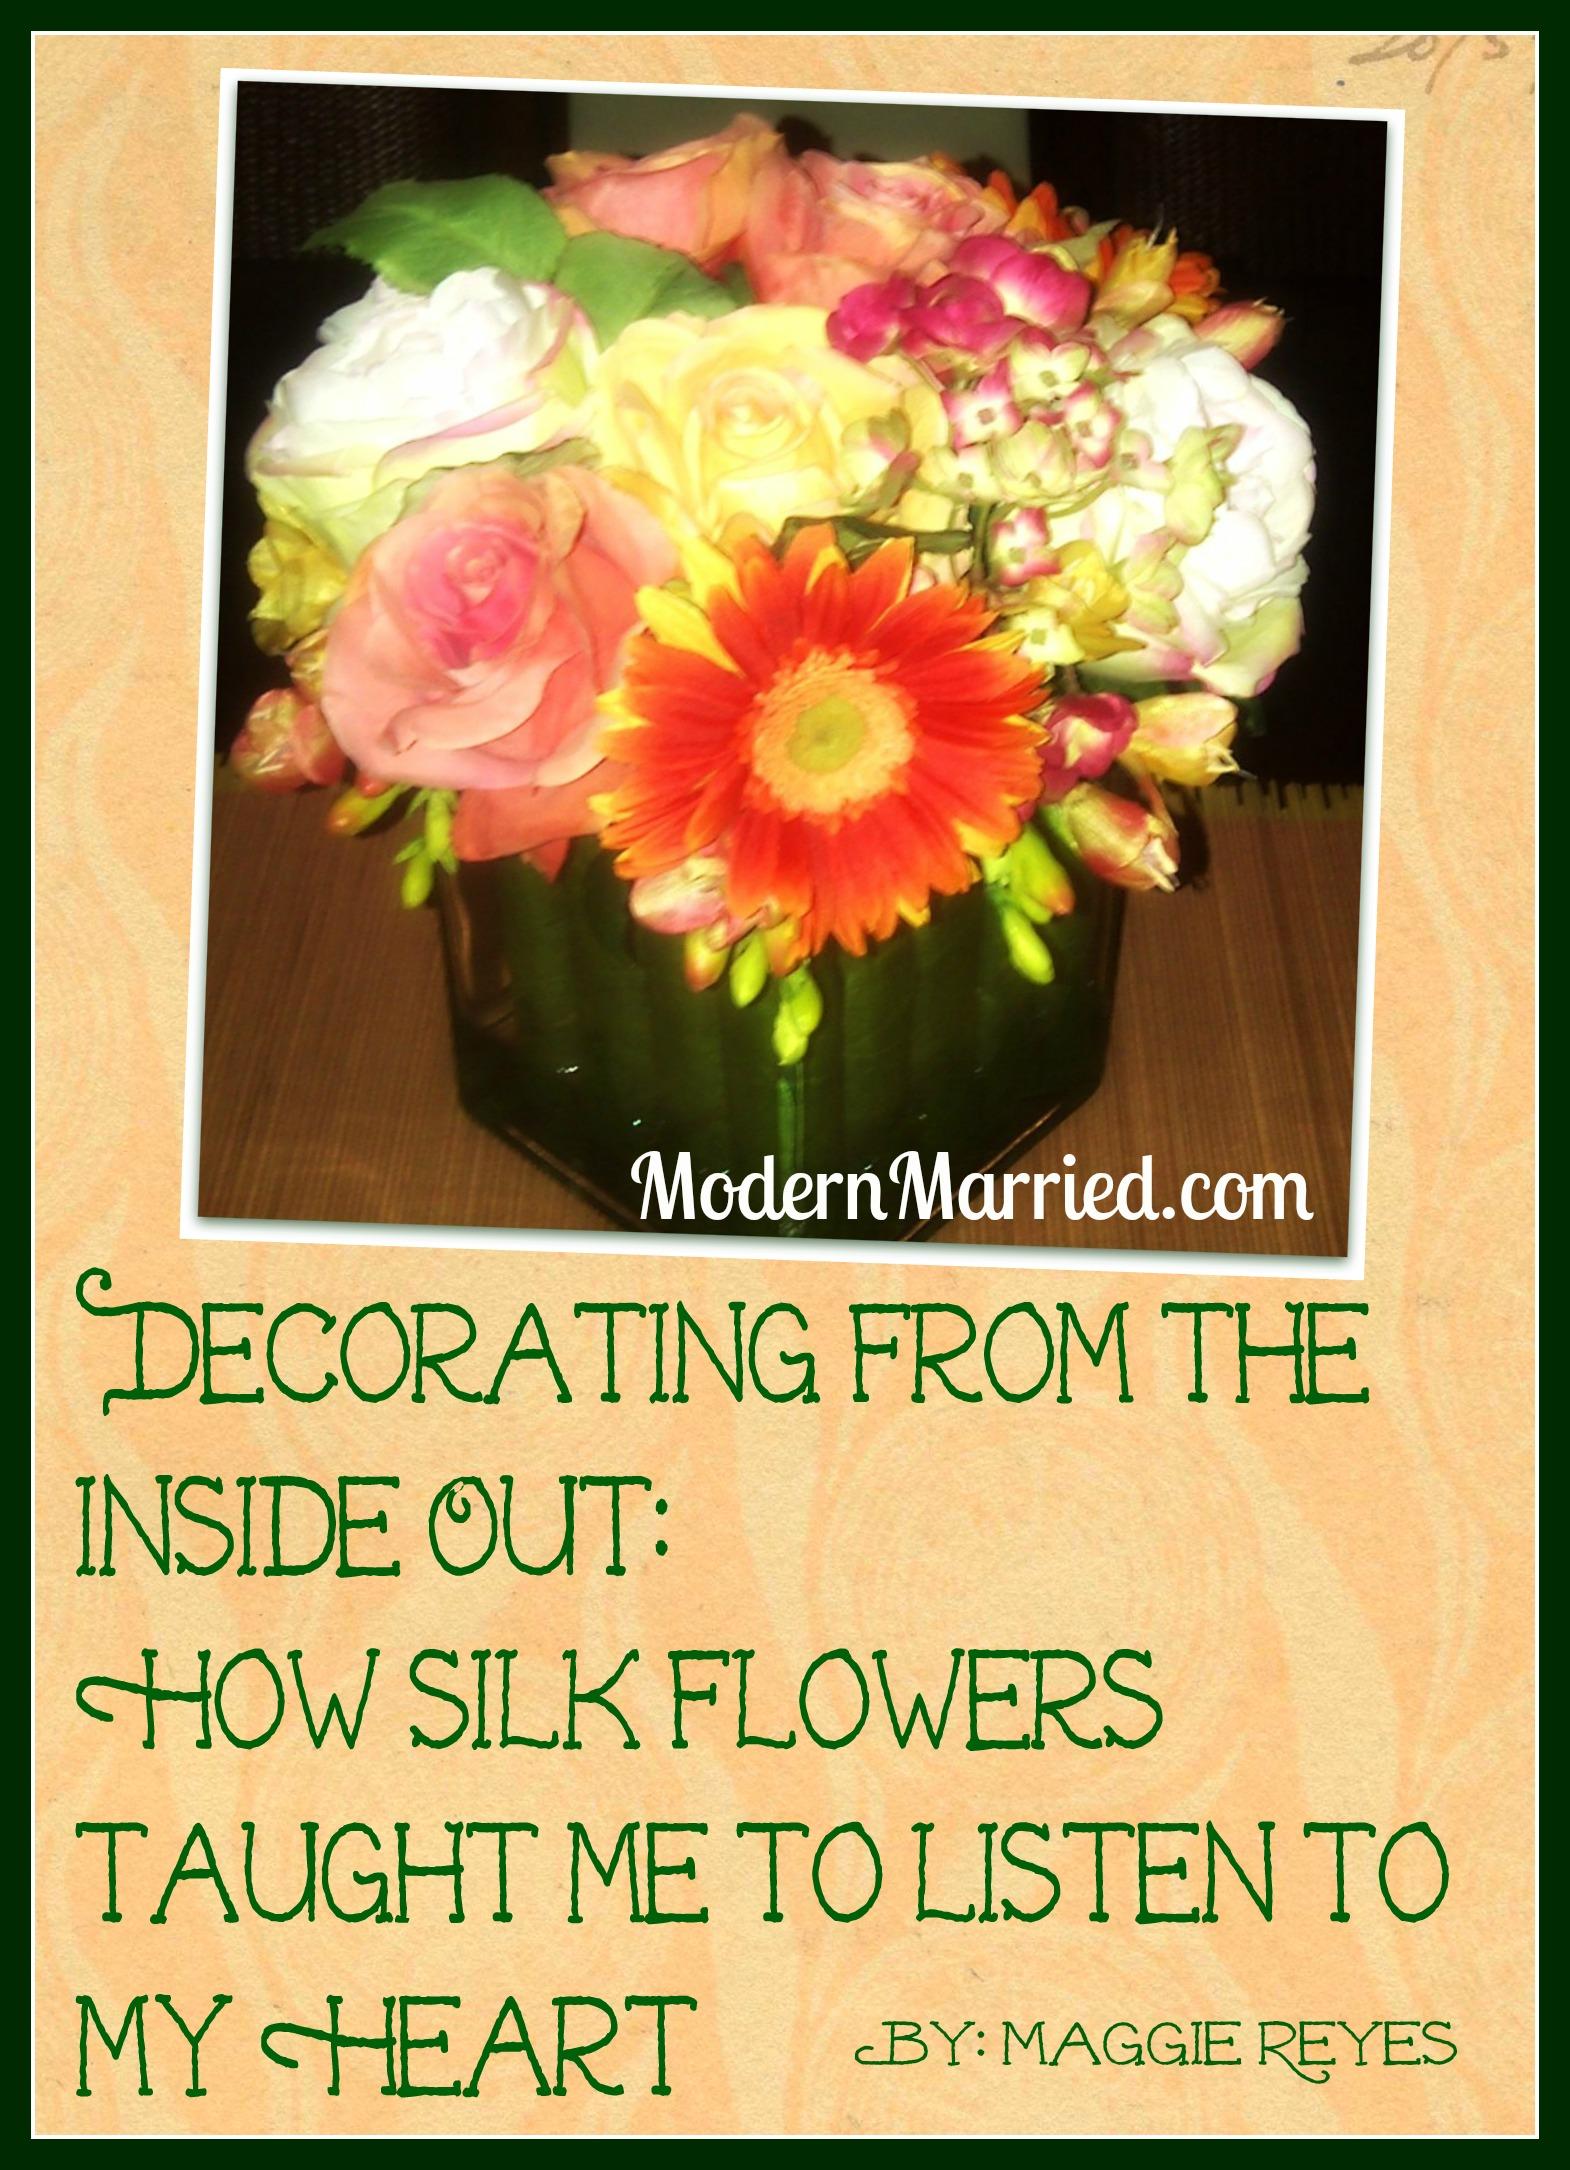 Silk flowers sarasota flowers ideas silk flowers sarasota fl images flower decoration ideas mightylinksfo